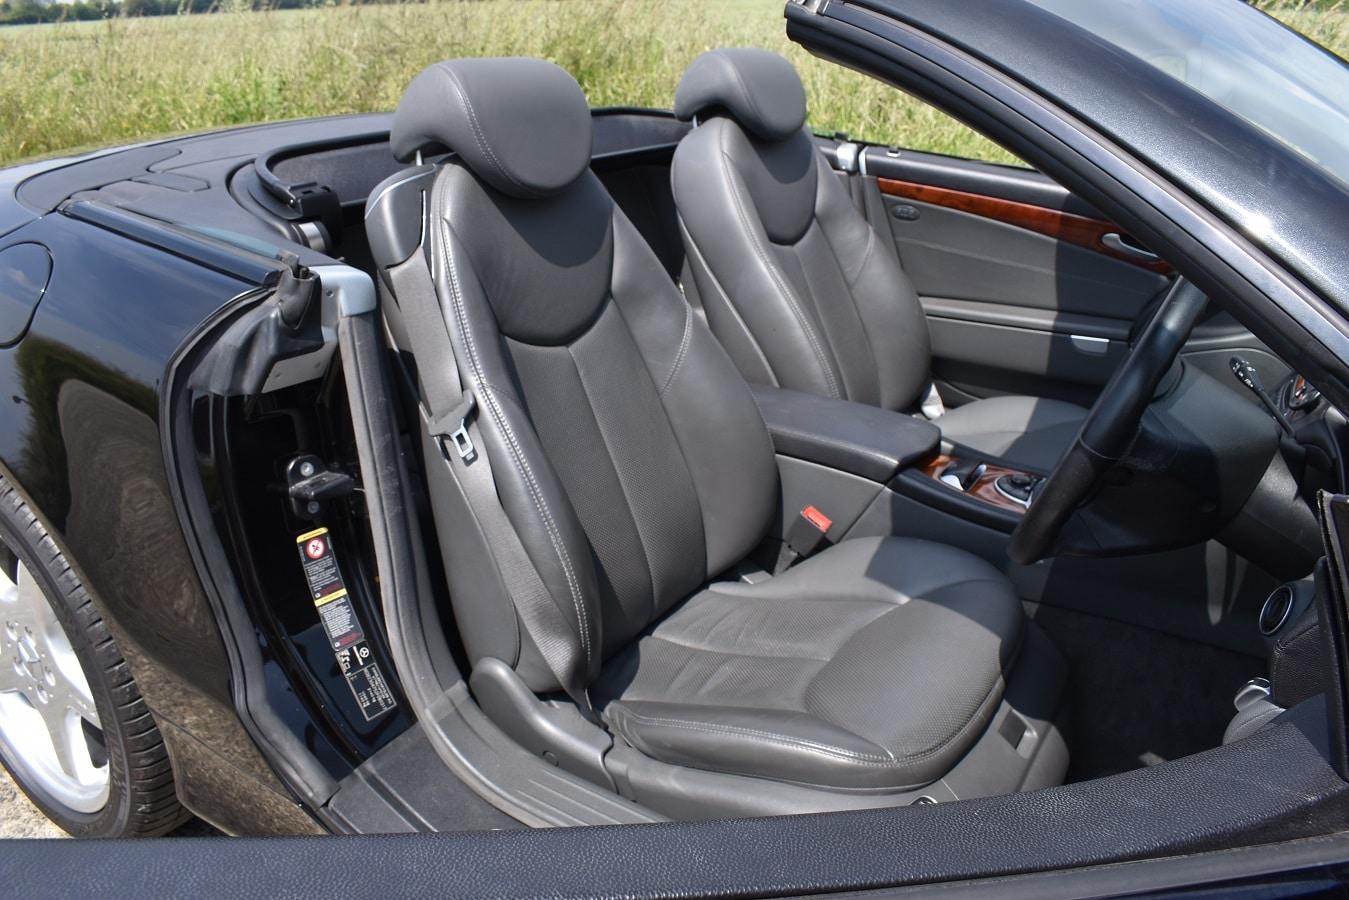 2004 Mercedes-Benz SL500 in Obsidian Black Metallic